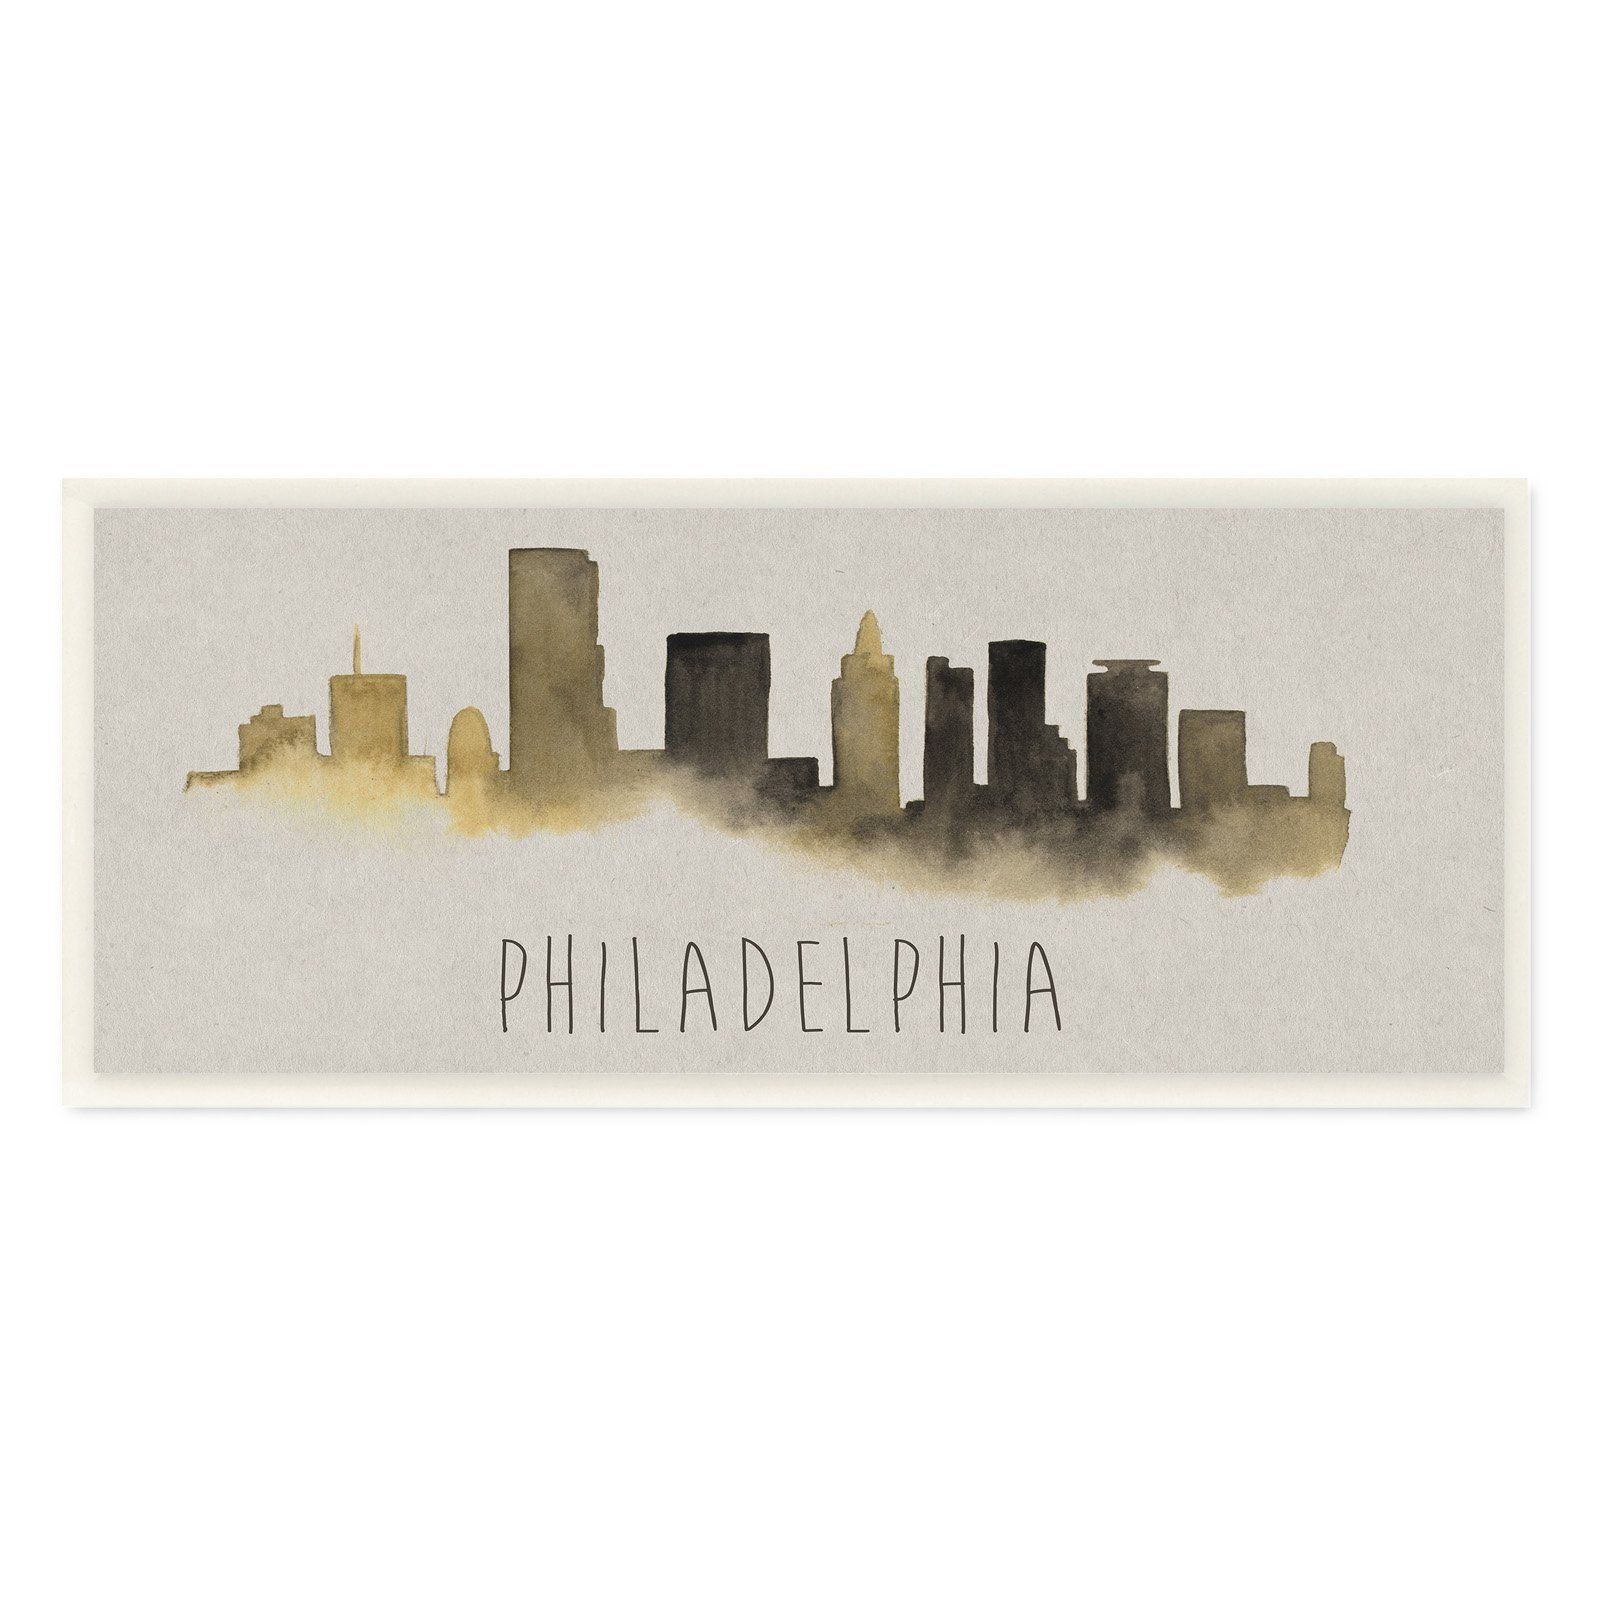 The Stupell Home Decor Collection Philadelphia Skyline Silhouette Wall Plaque Art Philadelphia Skyline Wall Art Plaques Skyline Silhouette